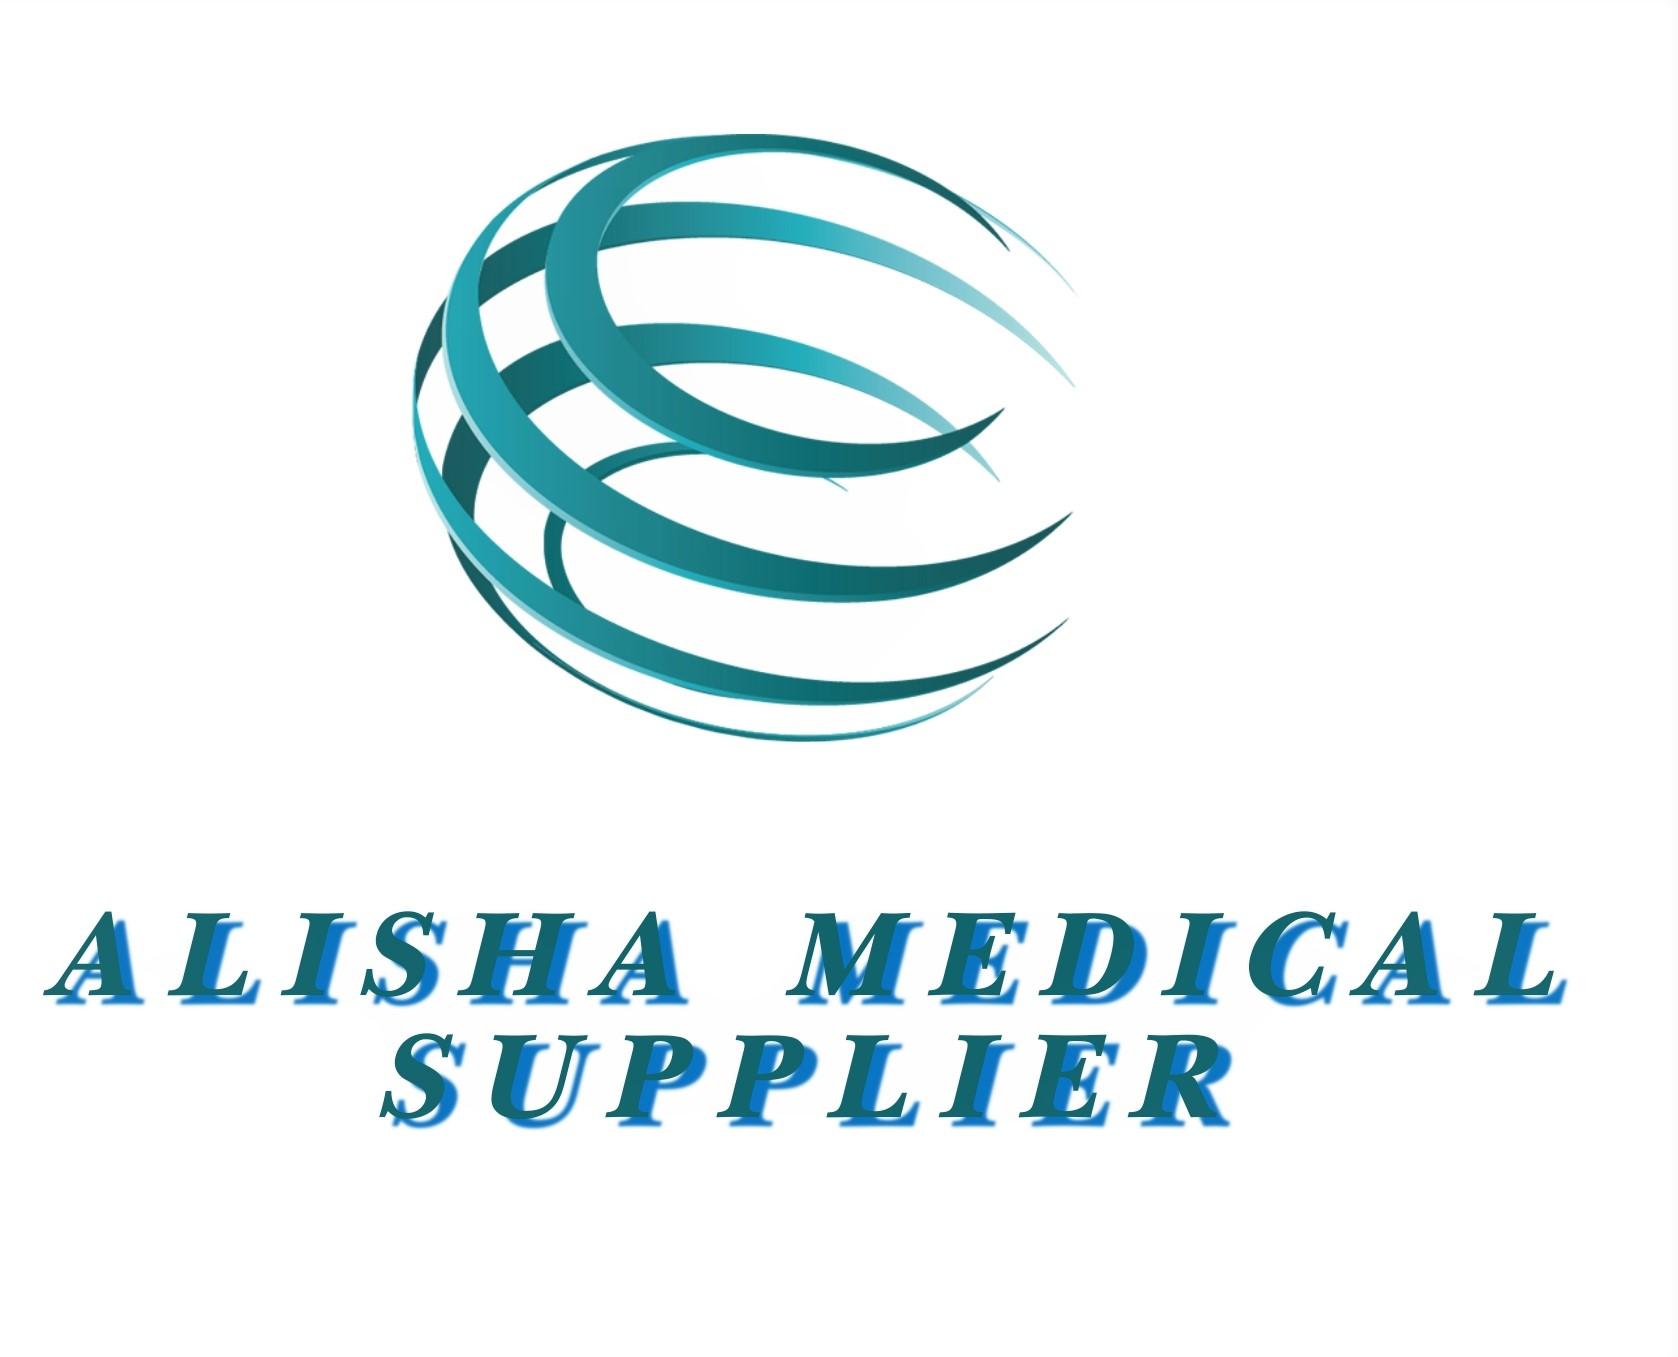 ALISHA MEDICAL SUPPLIERS